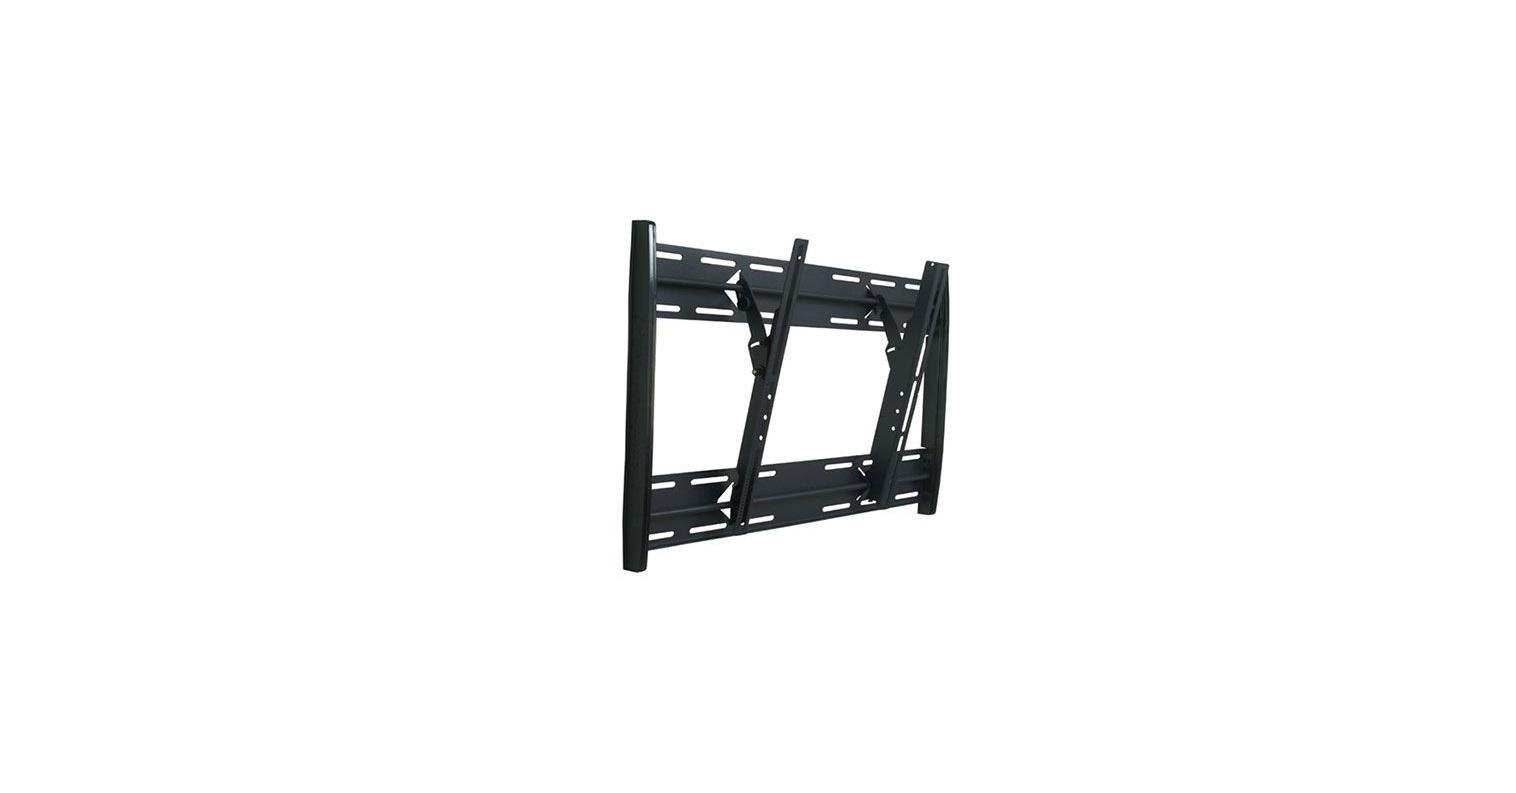 Premier Mounts PCM-MS2 Universal Tilt Wall Mount For 37-61 Flat Monitors